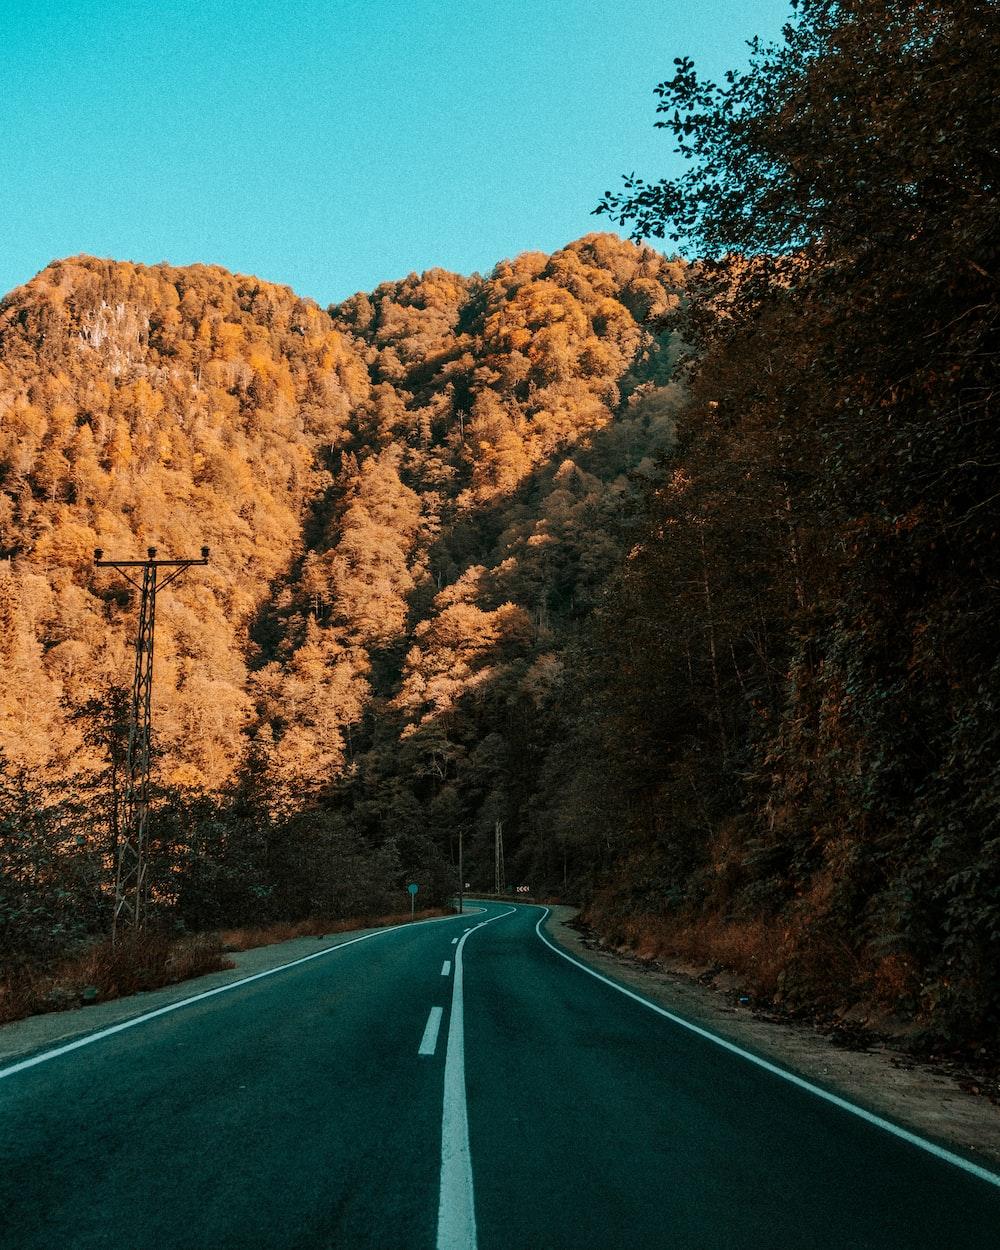 gray asphalt road between brown trees under blue sky during daytime